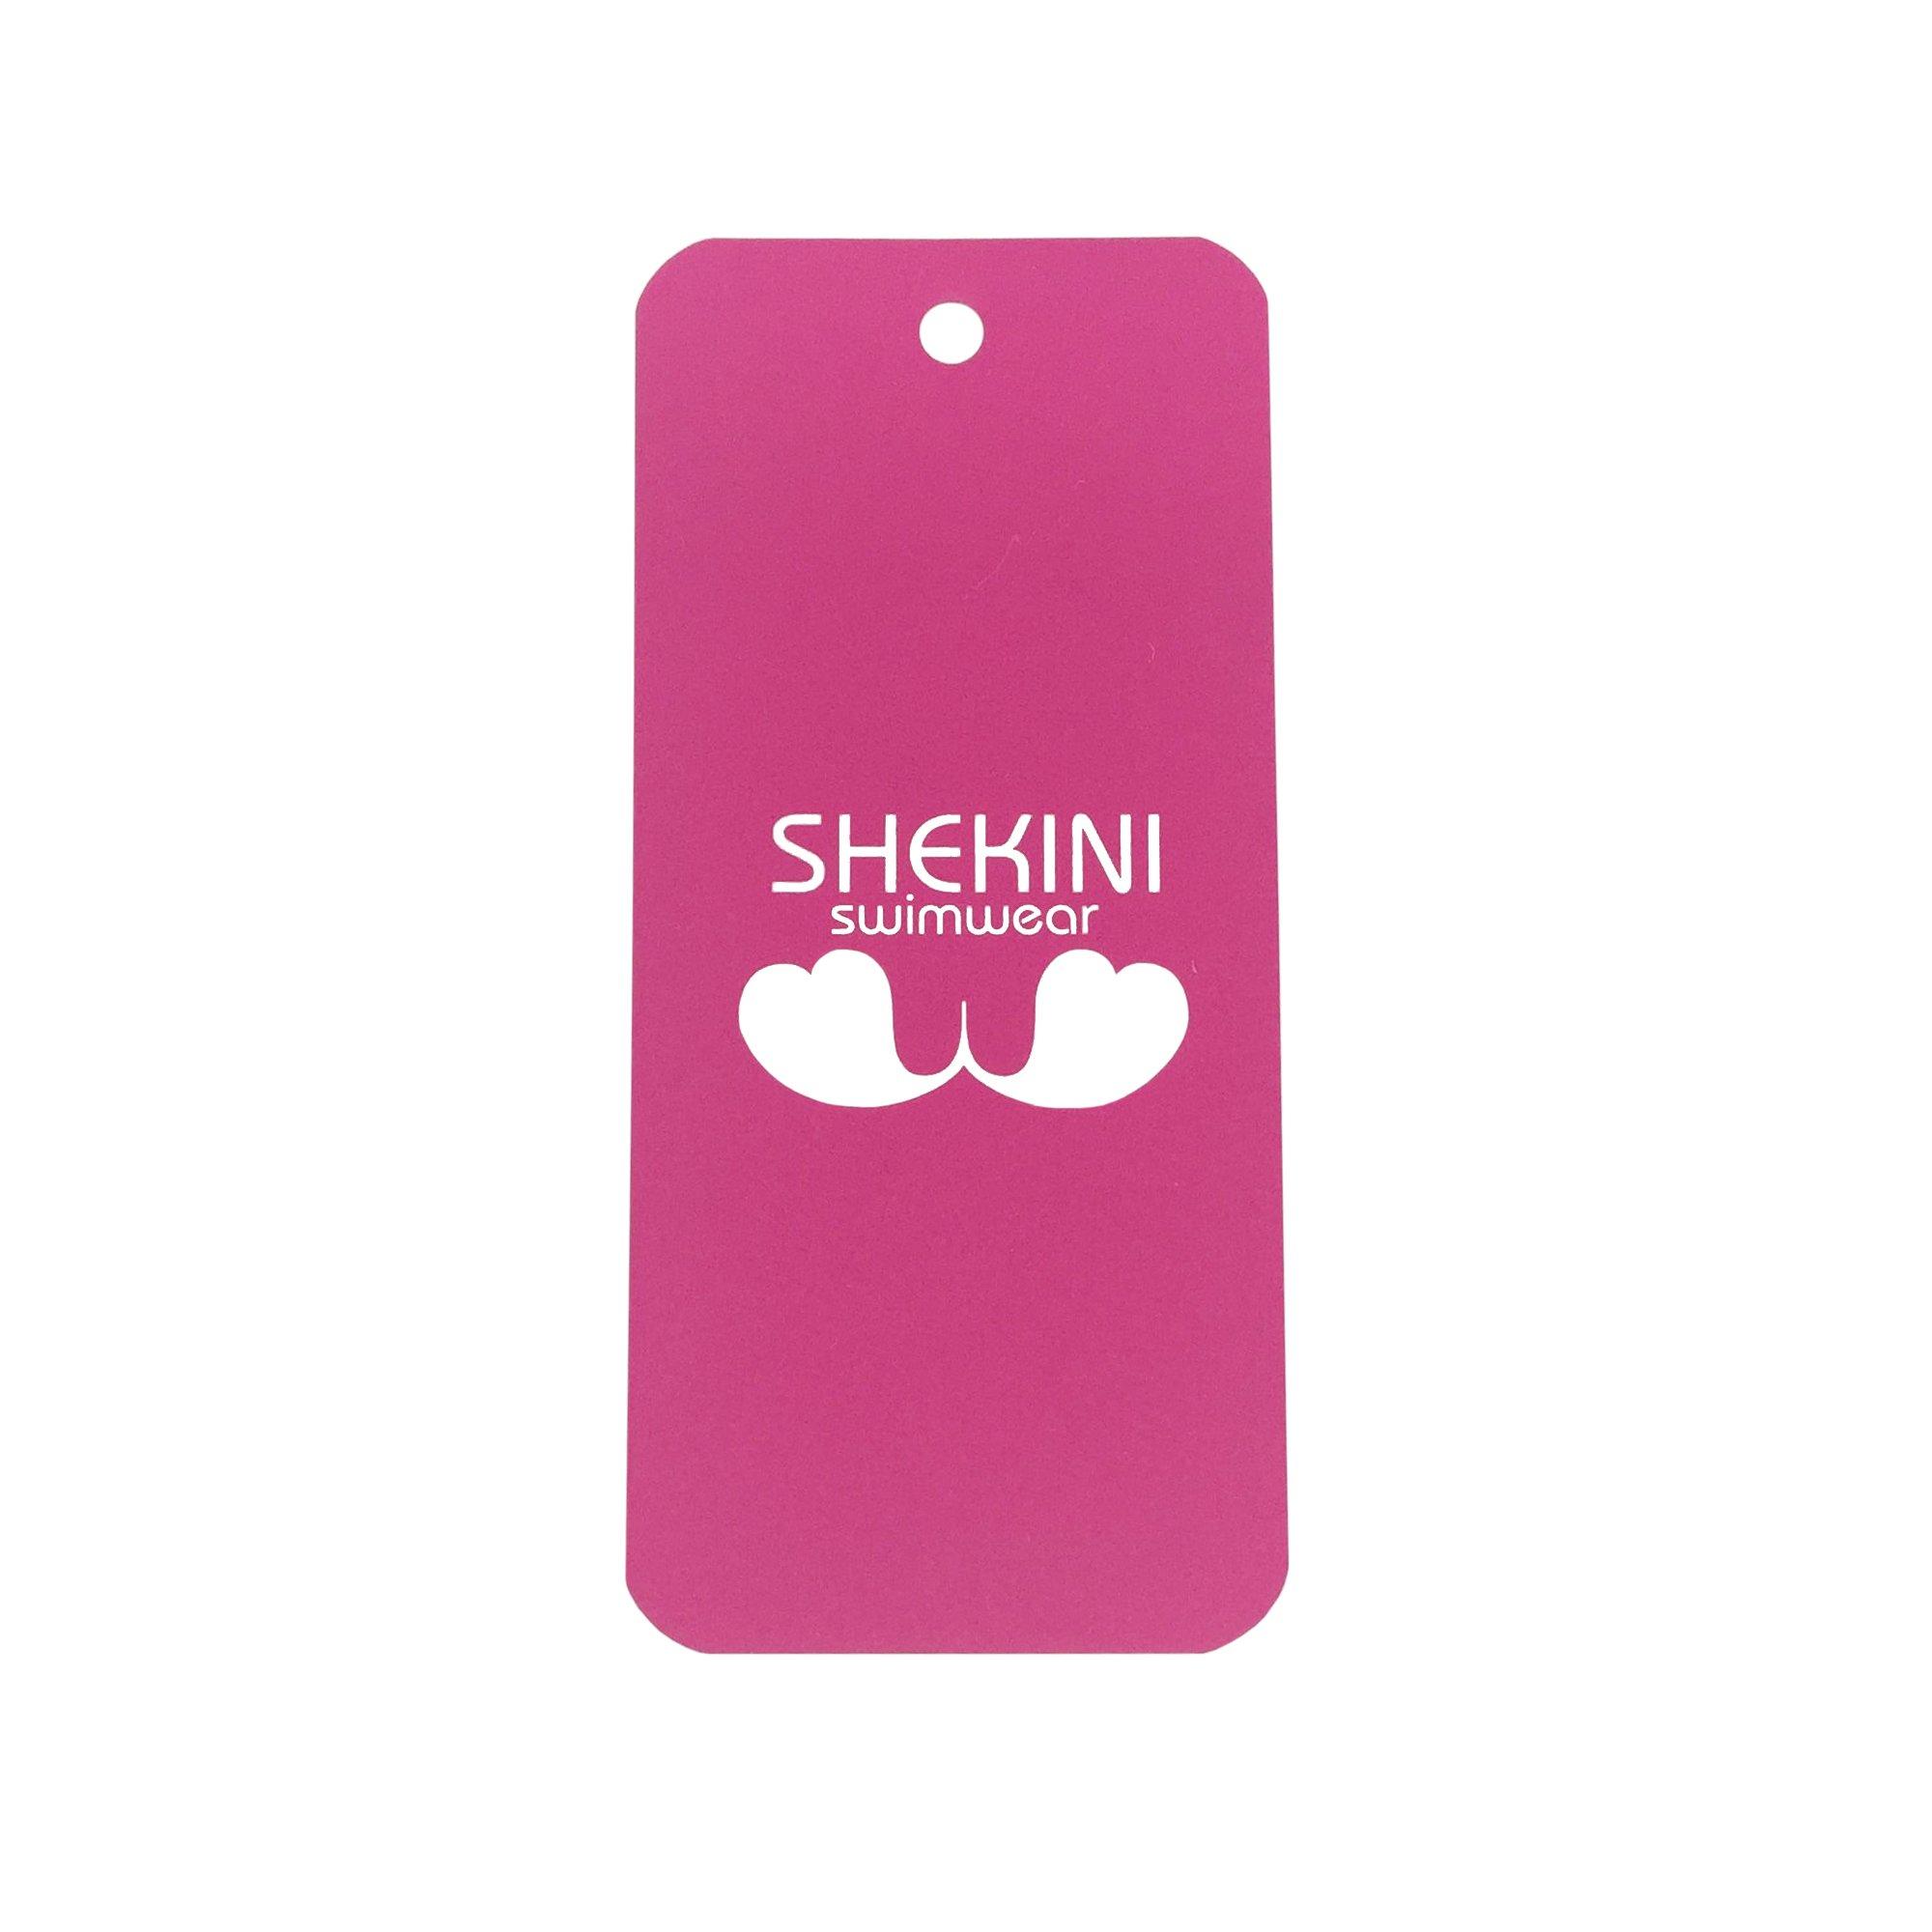 SHEKINI Womens Bathing Suits Floral Printing Swim Bottoms Padded Halter Bandage Bikini Two Piece Swimsuits (Medium, Wine Red) by SHEKINI (Image #7)